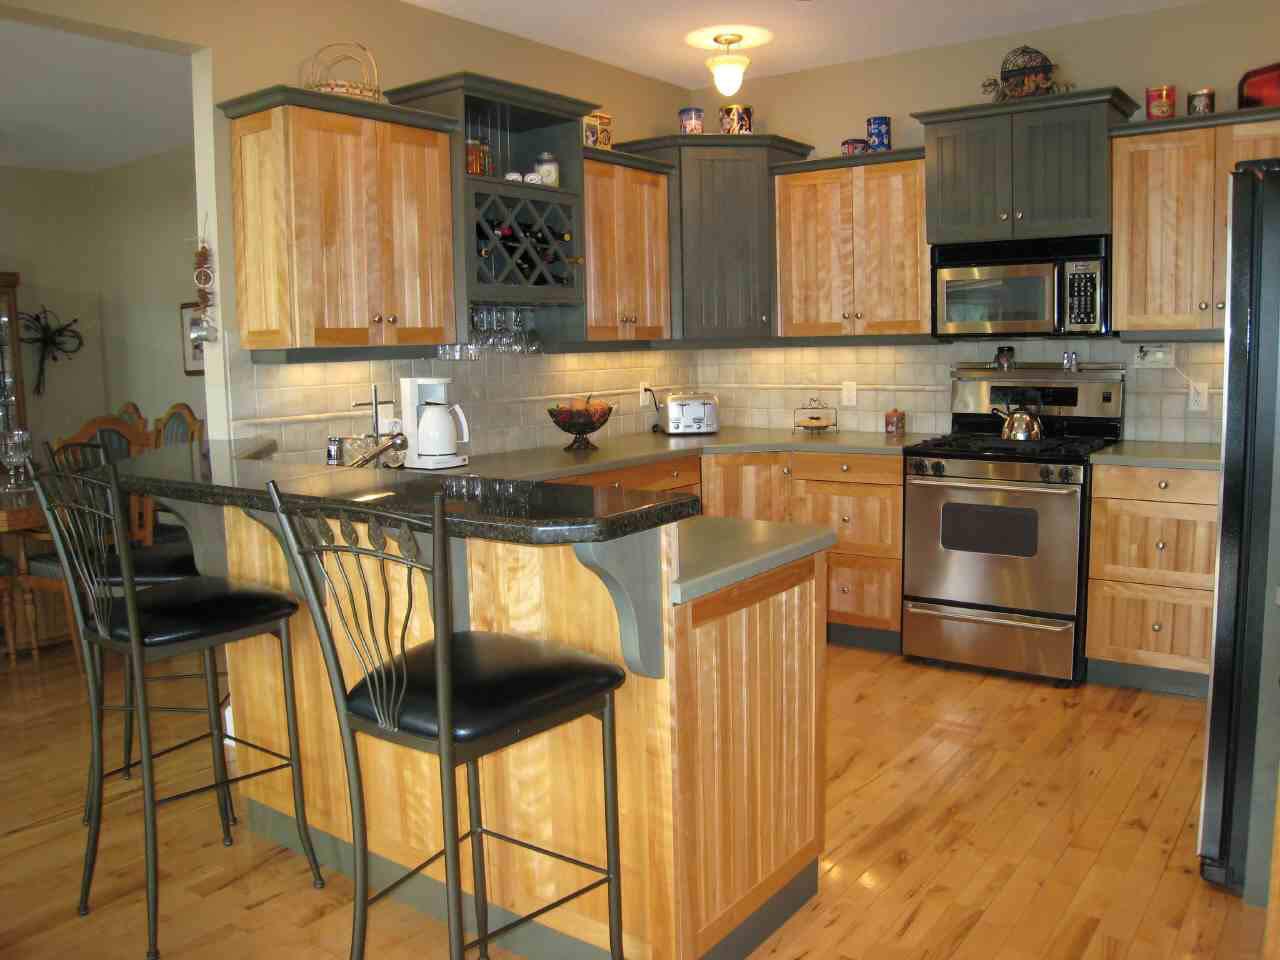 Kitchen step stool Photo - 1